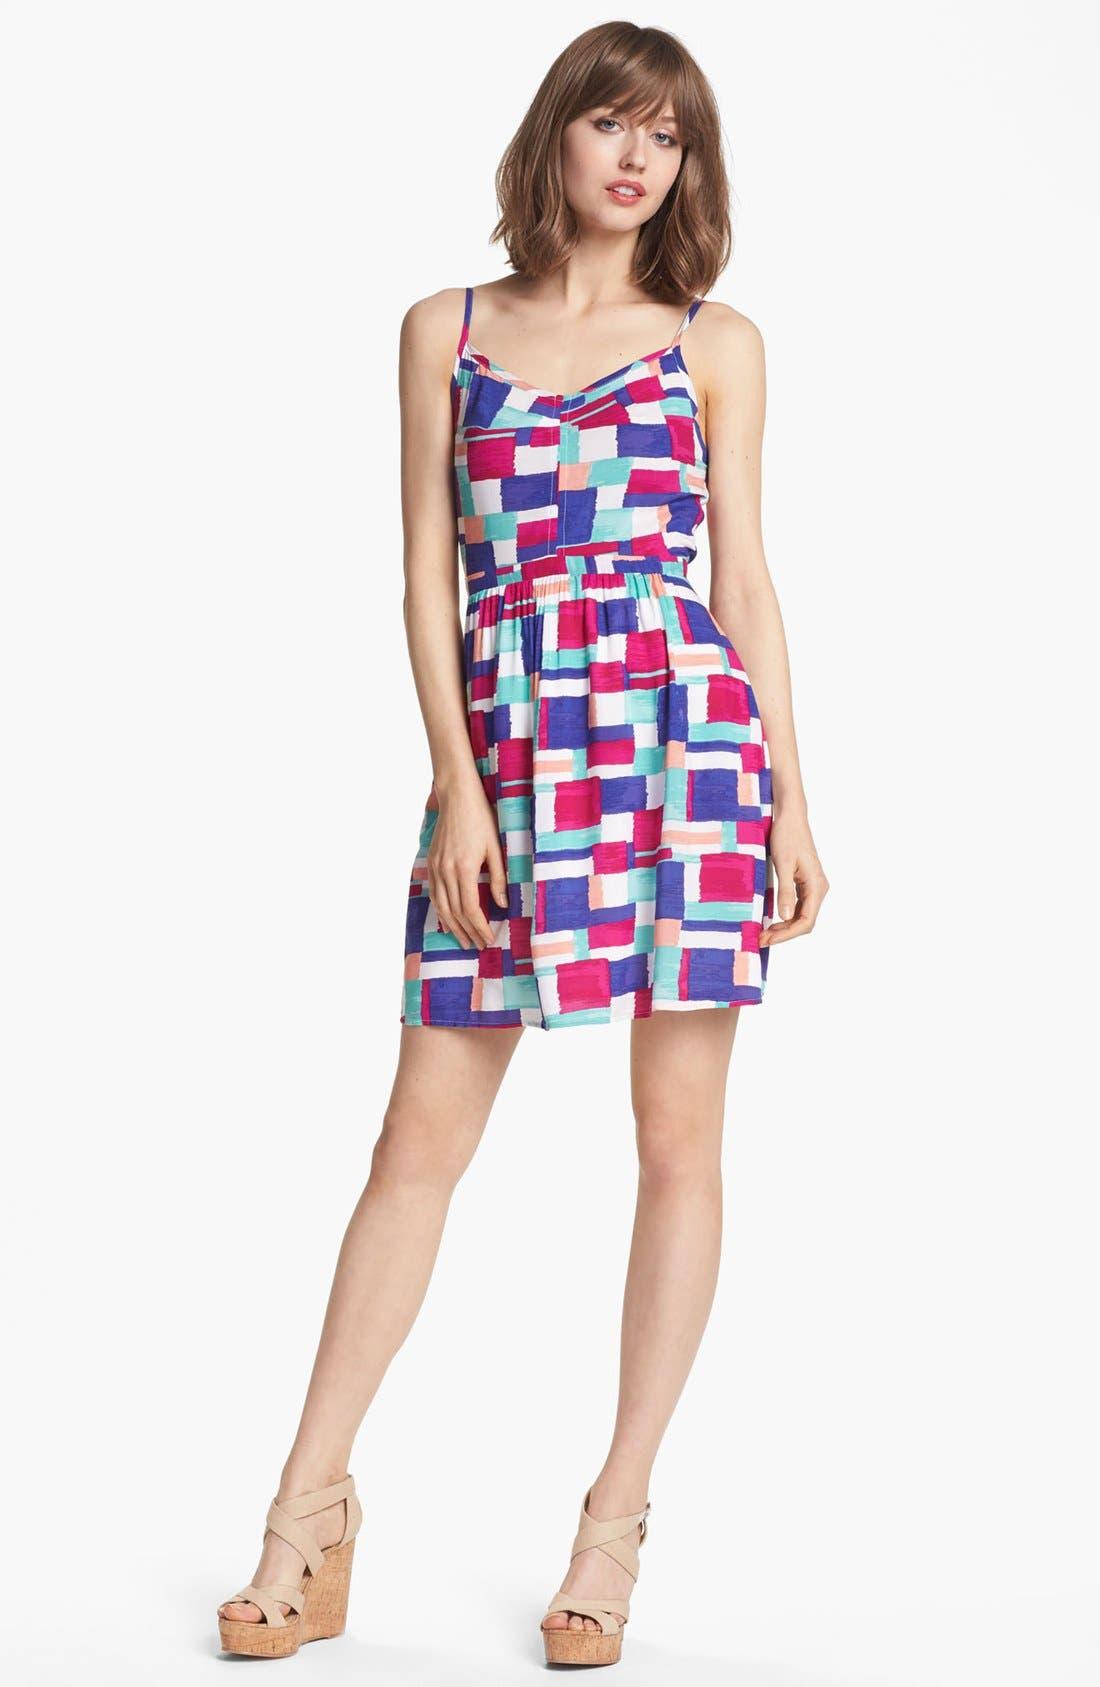 Alternate Image 1 Selected - Splendid 'Painted Patchwork' Print Dress